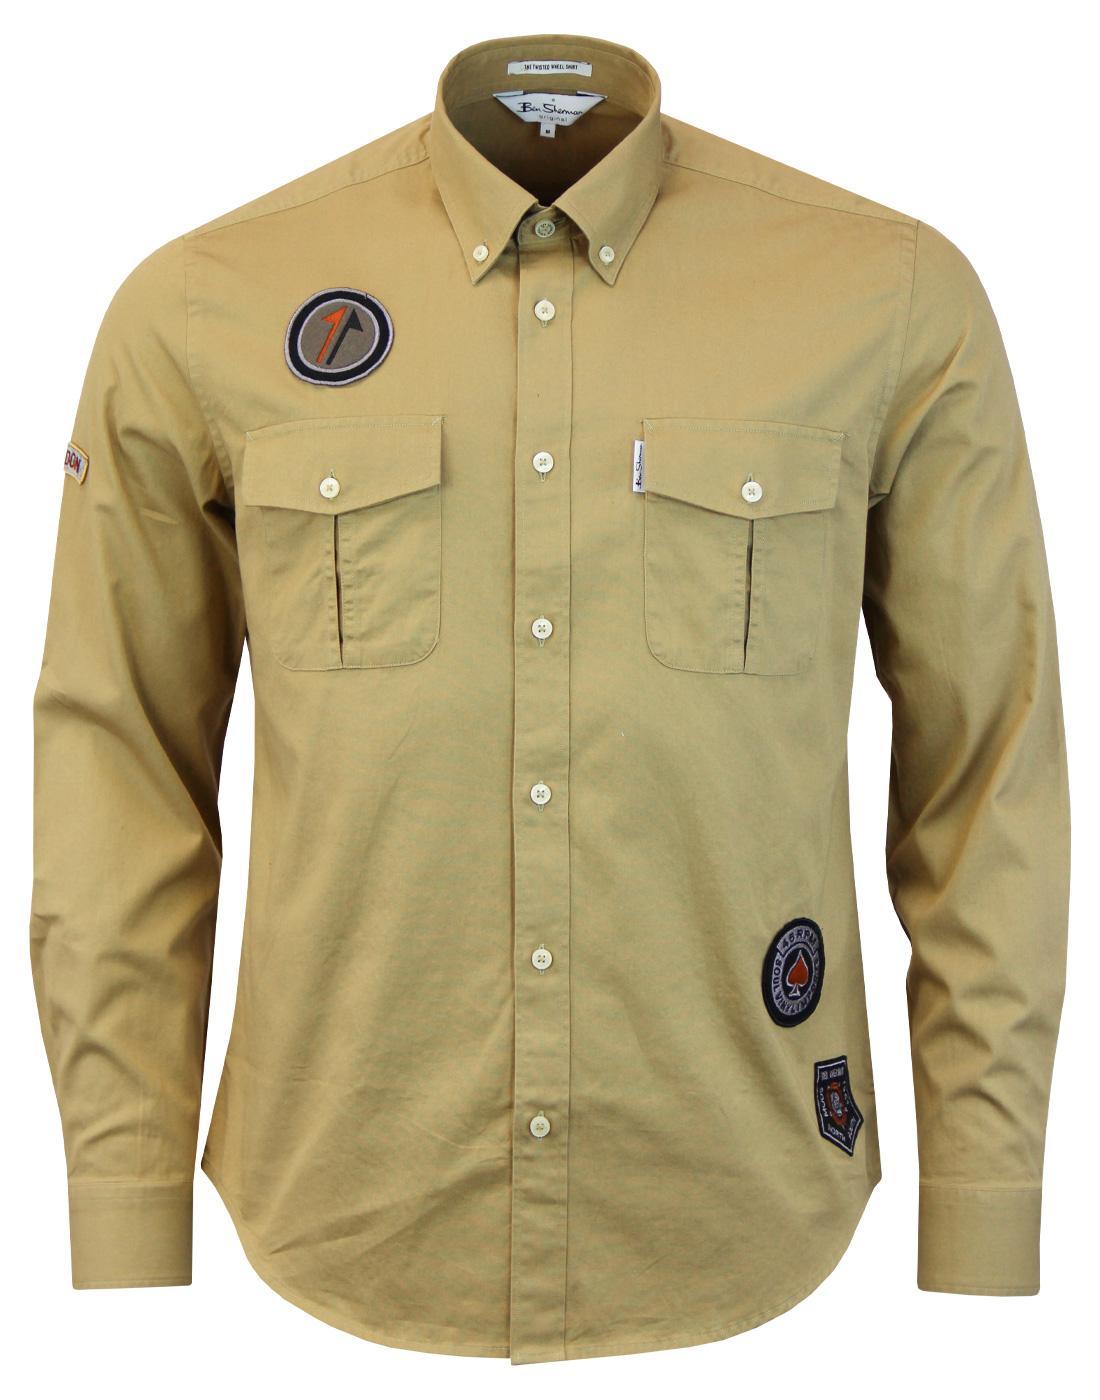 Twisted Wheel BEN SHERMAN Northern Soul Army Shirt